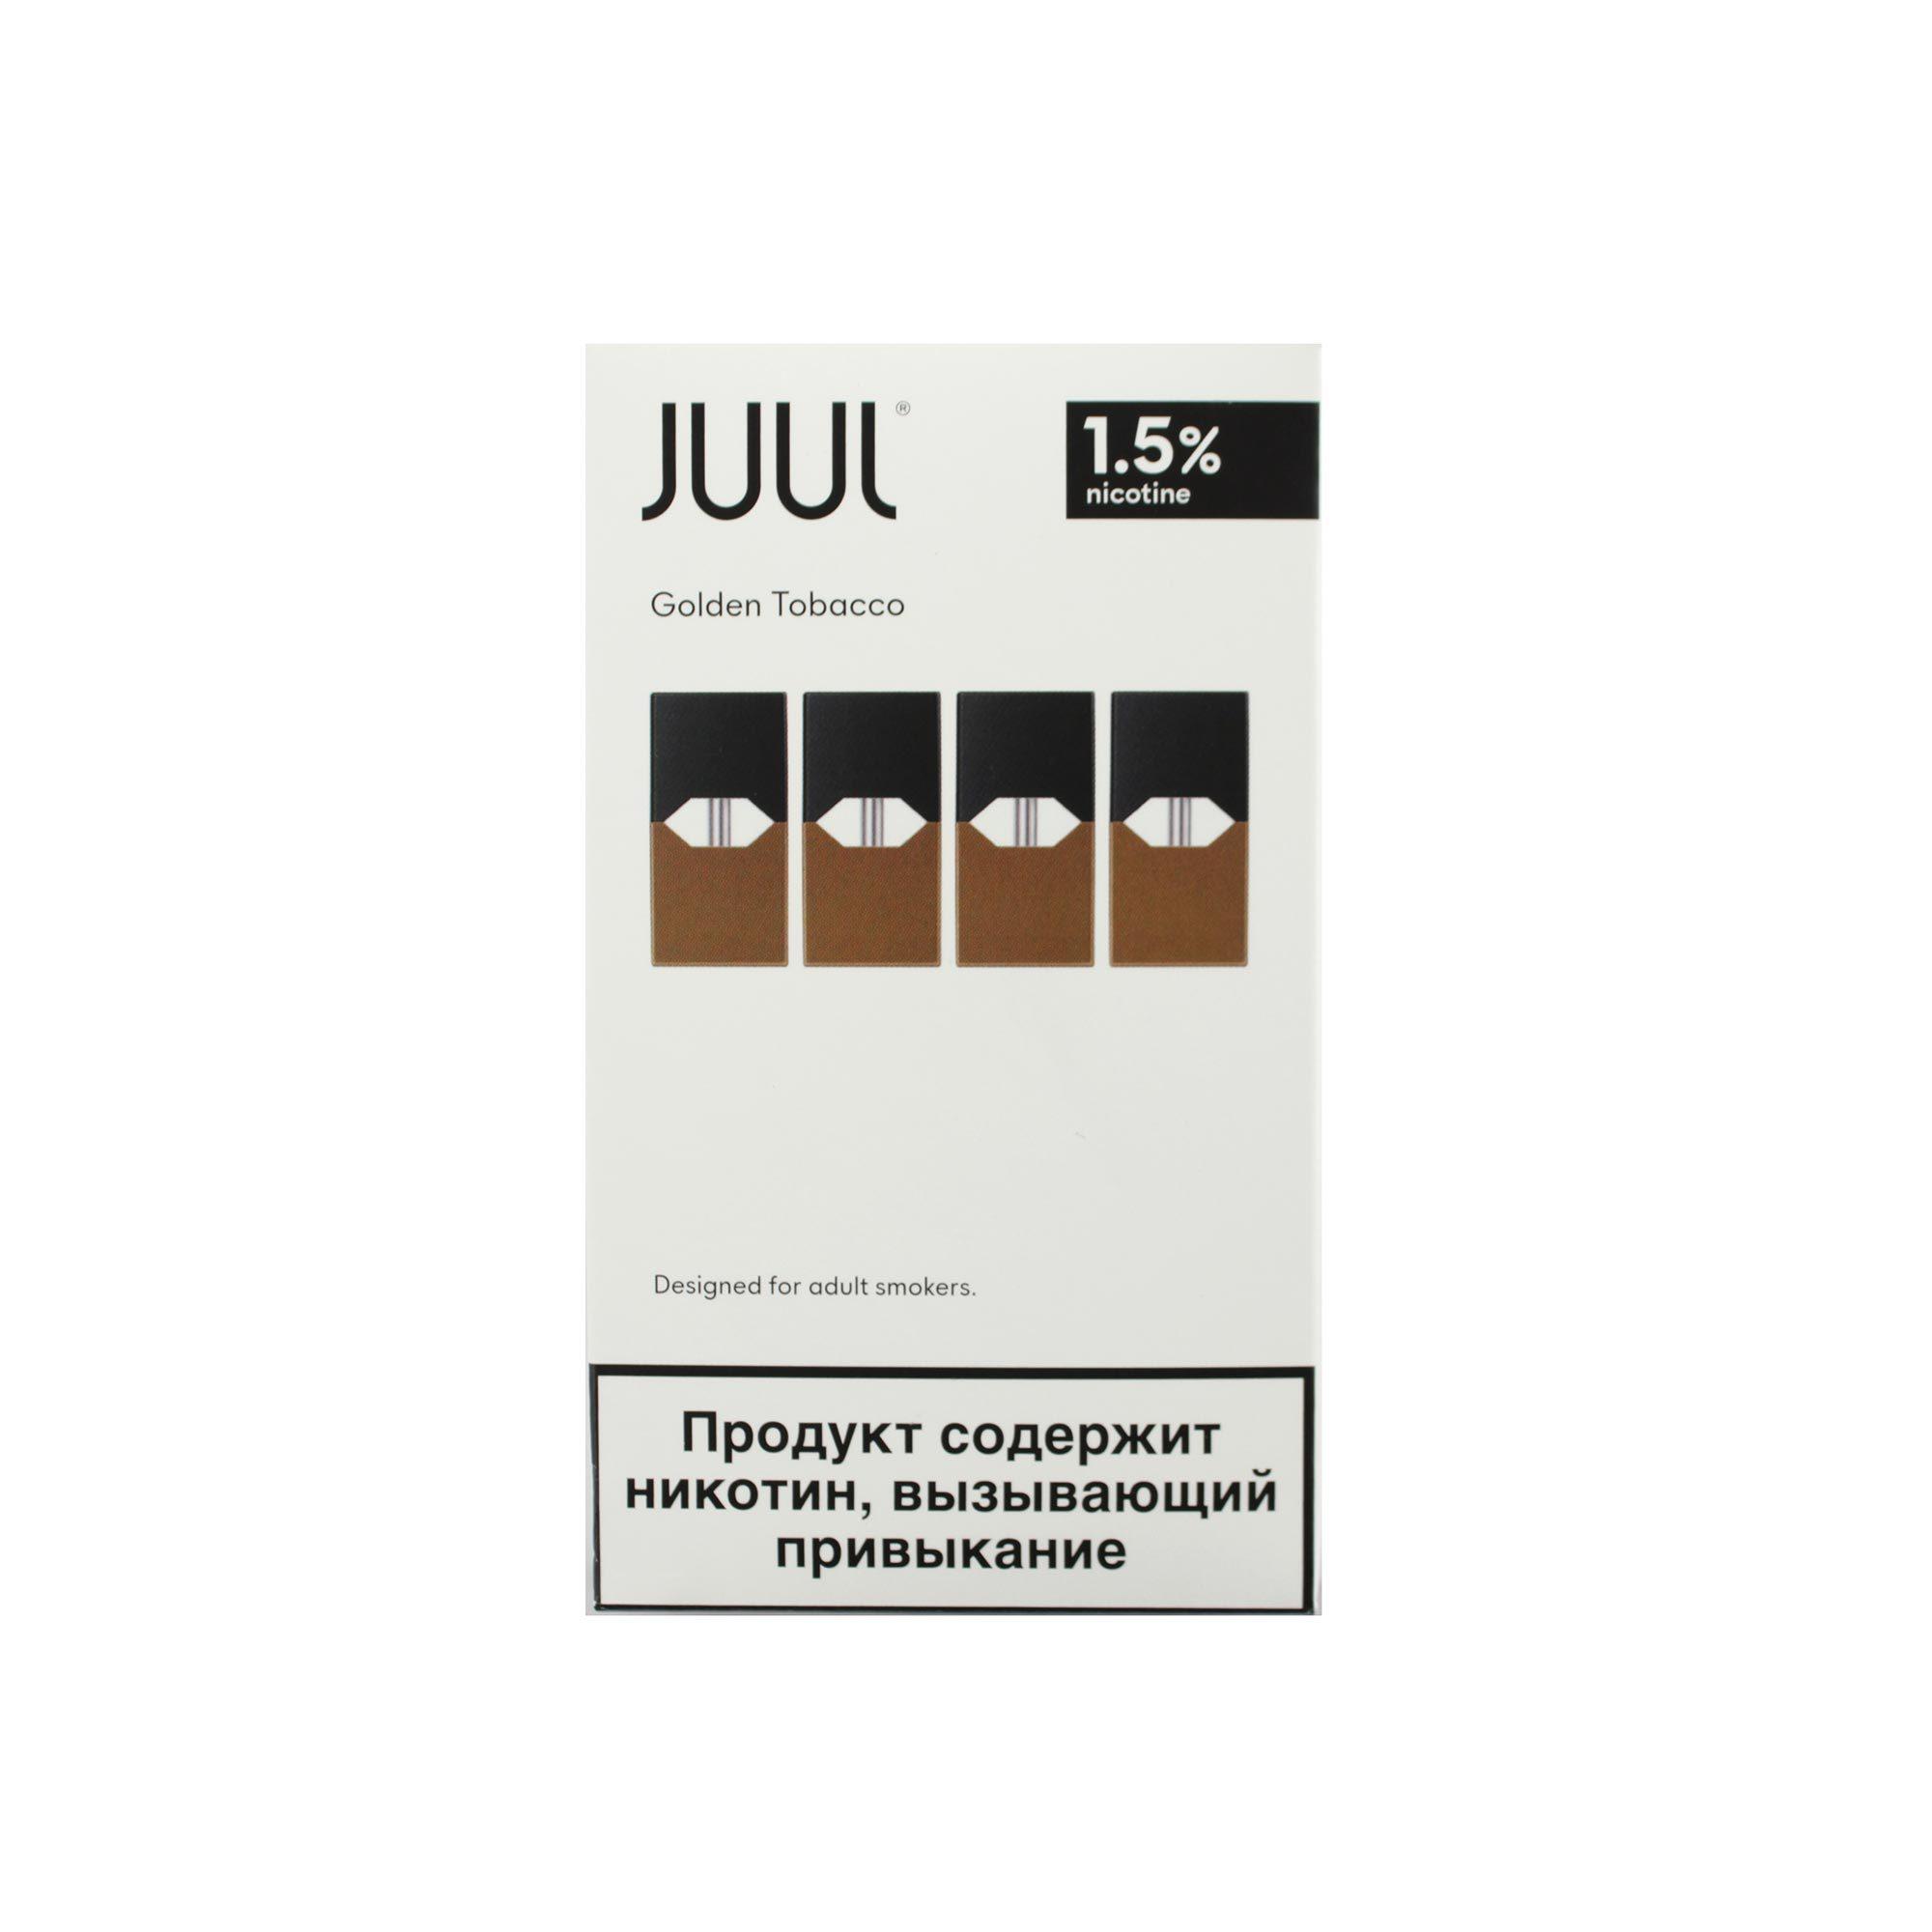 Сменный Картридж для JUUL. ДЖУЛ Golden Tobacco х4, 0,7 мл 15 мг